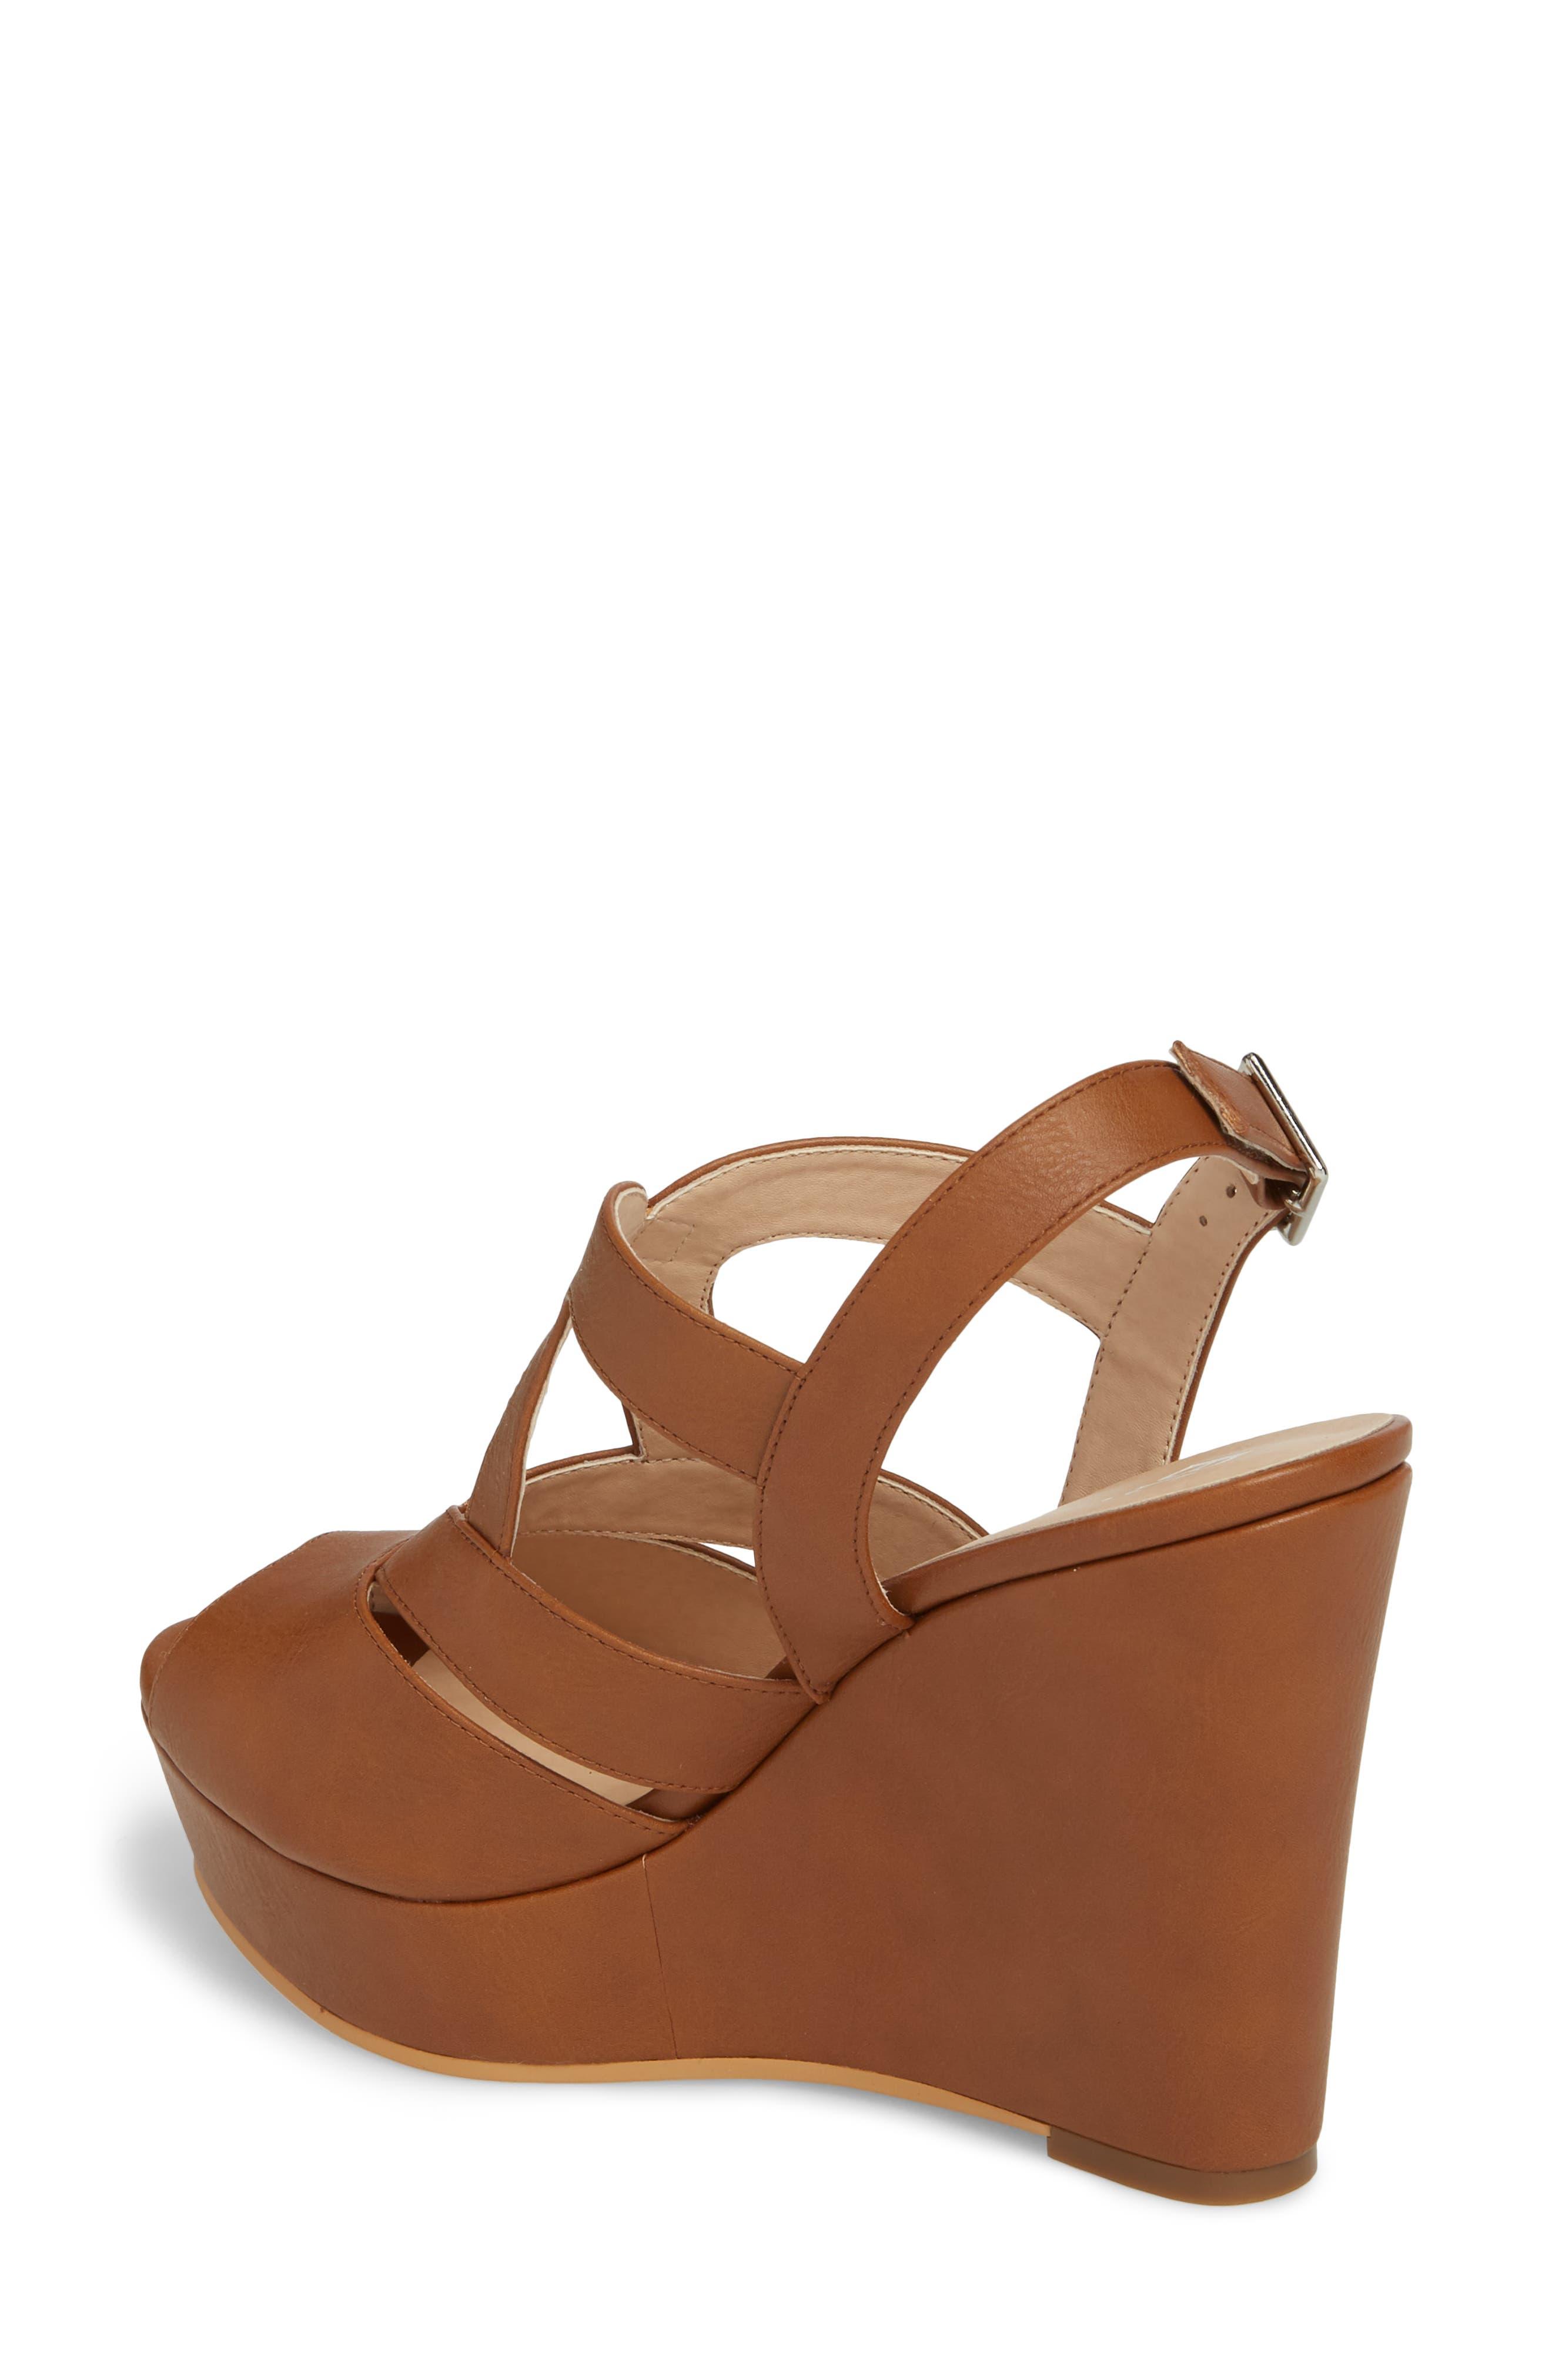 Sunny Platform Wedge Sandal,                             Alternate thumbnail 10, color,